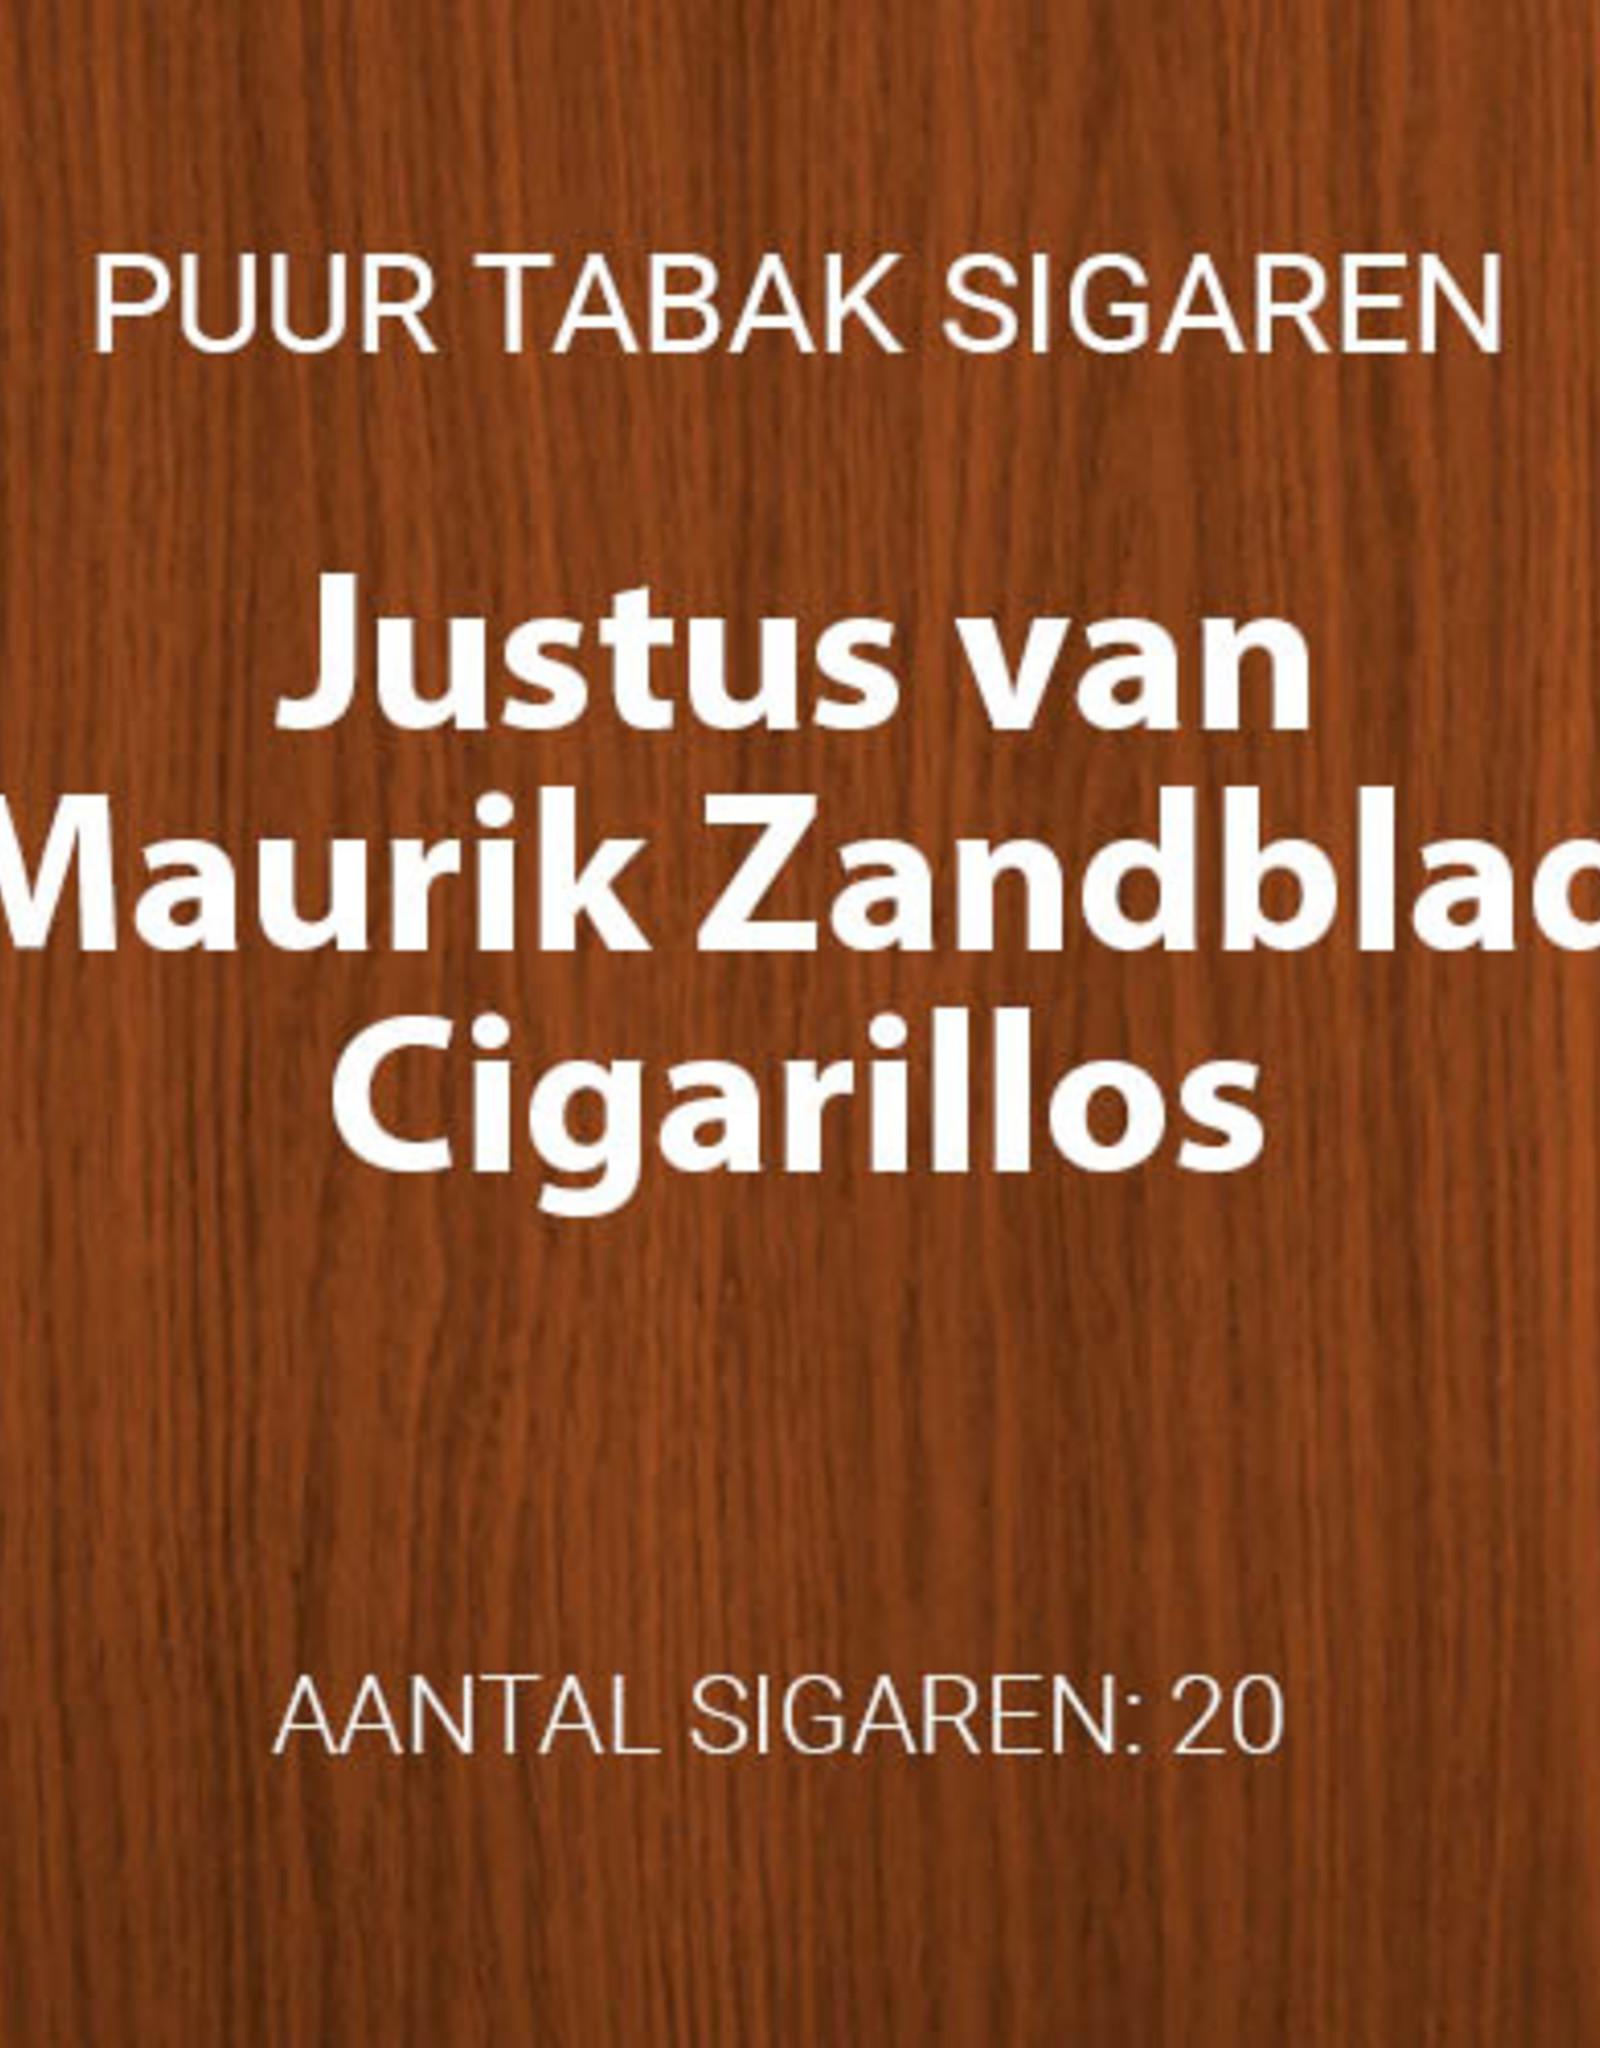 Justus van Maurik Zandblad Cigarillos 20 stuks